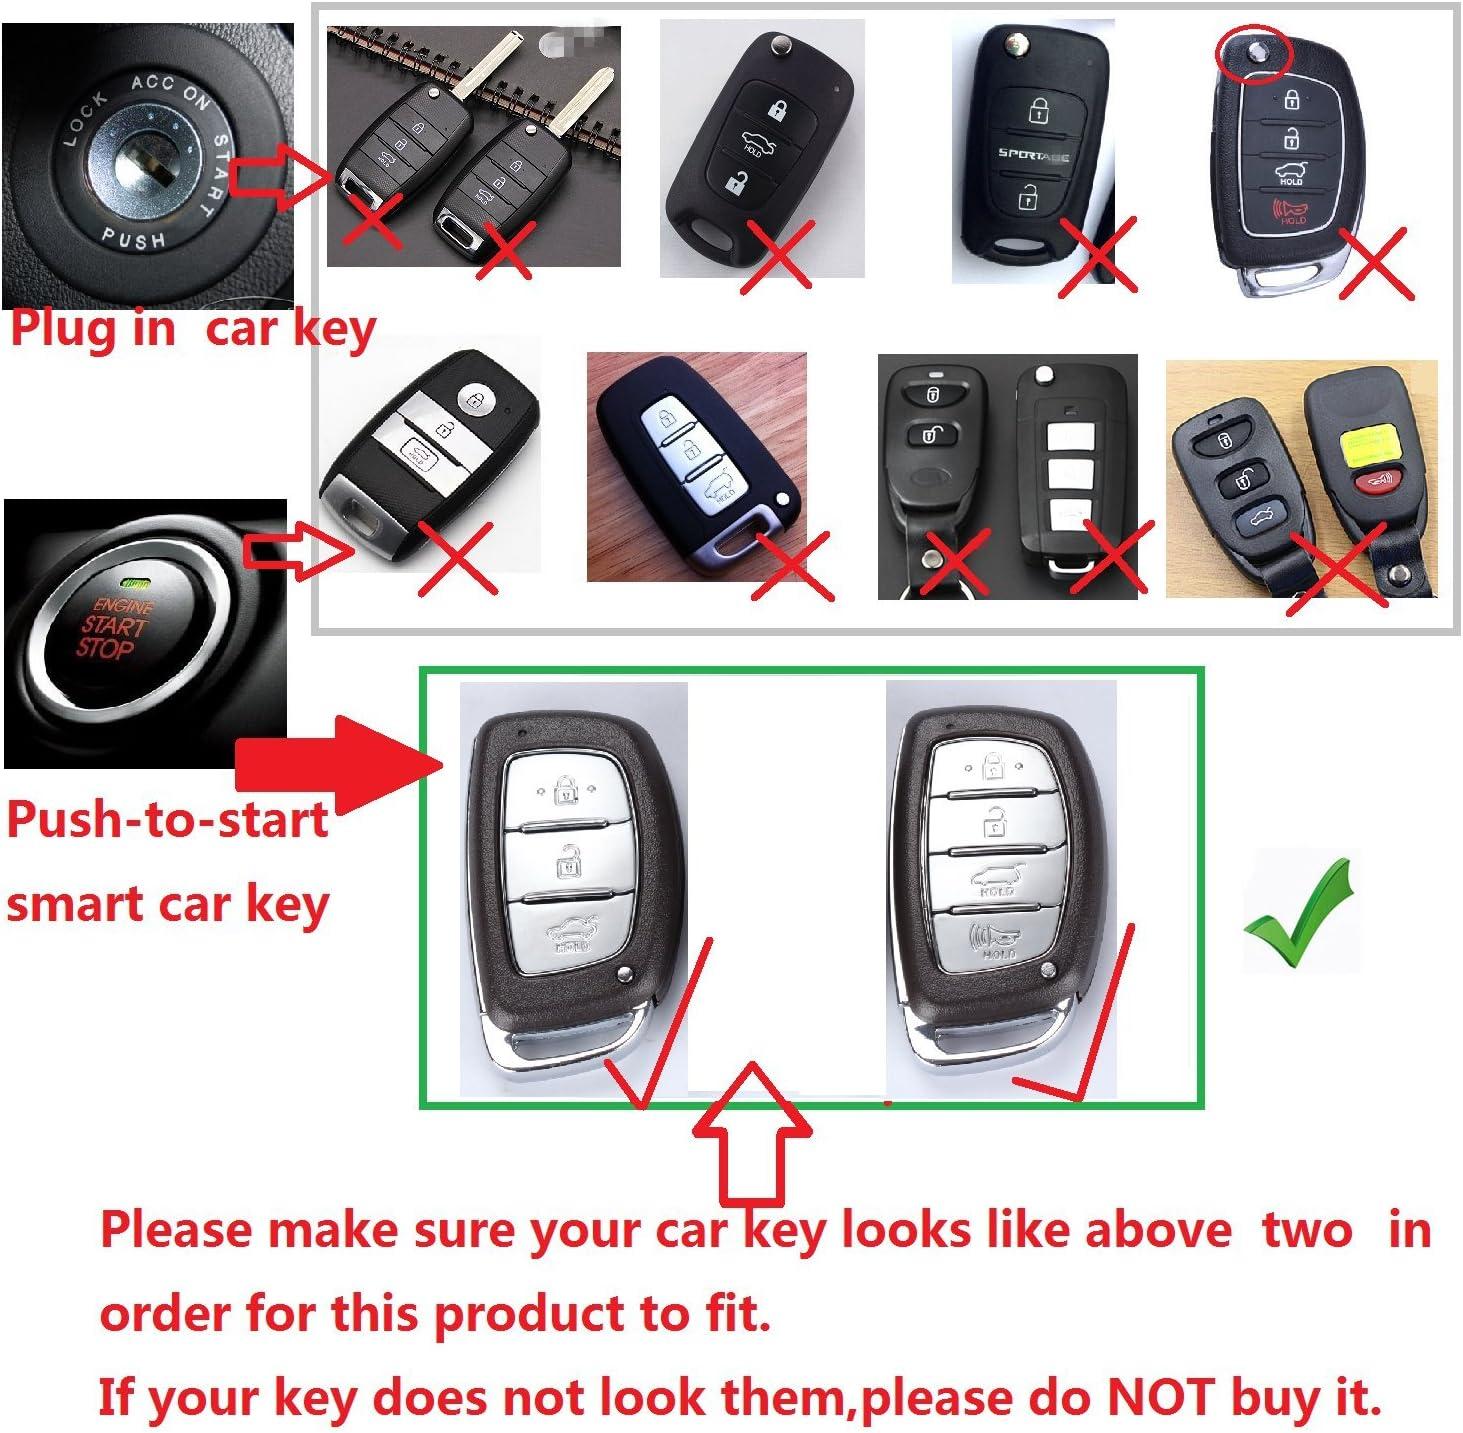 Key Fob Cover Fits for Hyundai Verna Style Elantra Mistra Sonata 9 Tucson ix25 ix35 M.JVisun Key Covers for Car Keys Hyundai Smart Key Silver Aluminum Key Fob Case Key Protector for Men /& Women